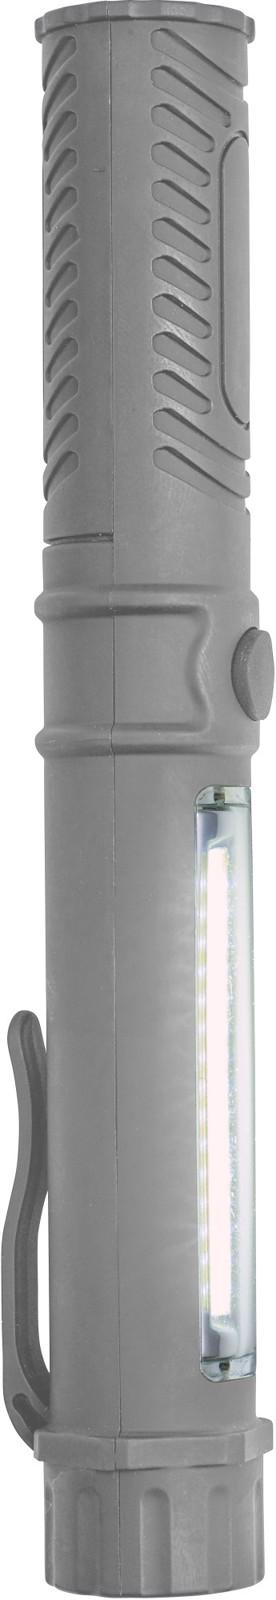 ABS work light/torch - Grey